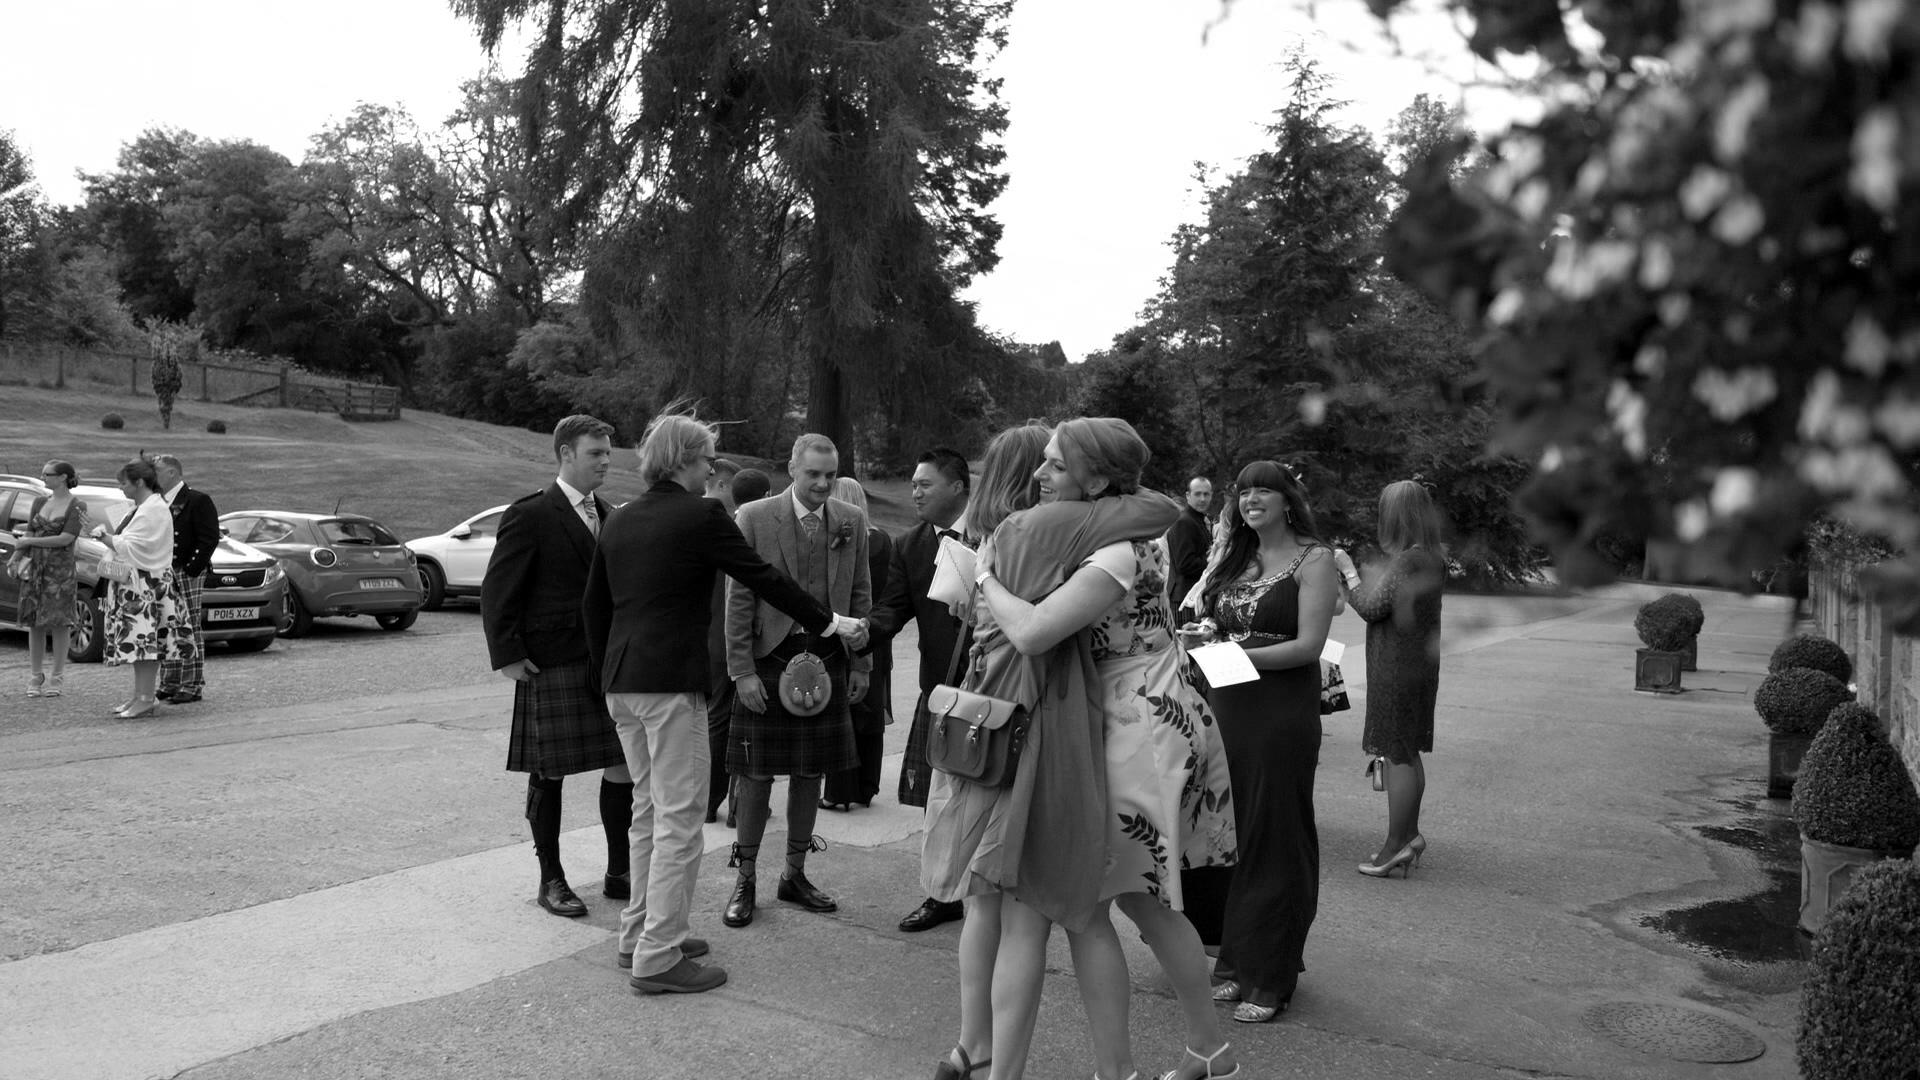 ASWANLEY-SUMMER-WEDDING (04).jpg